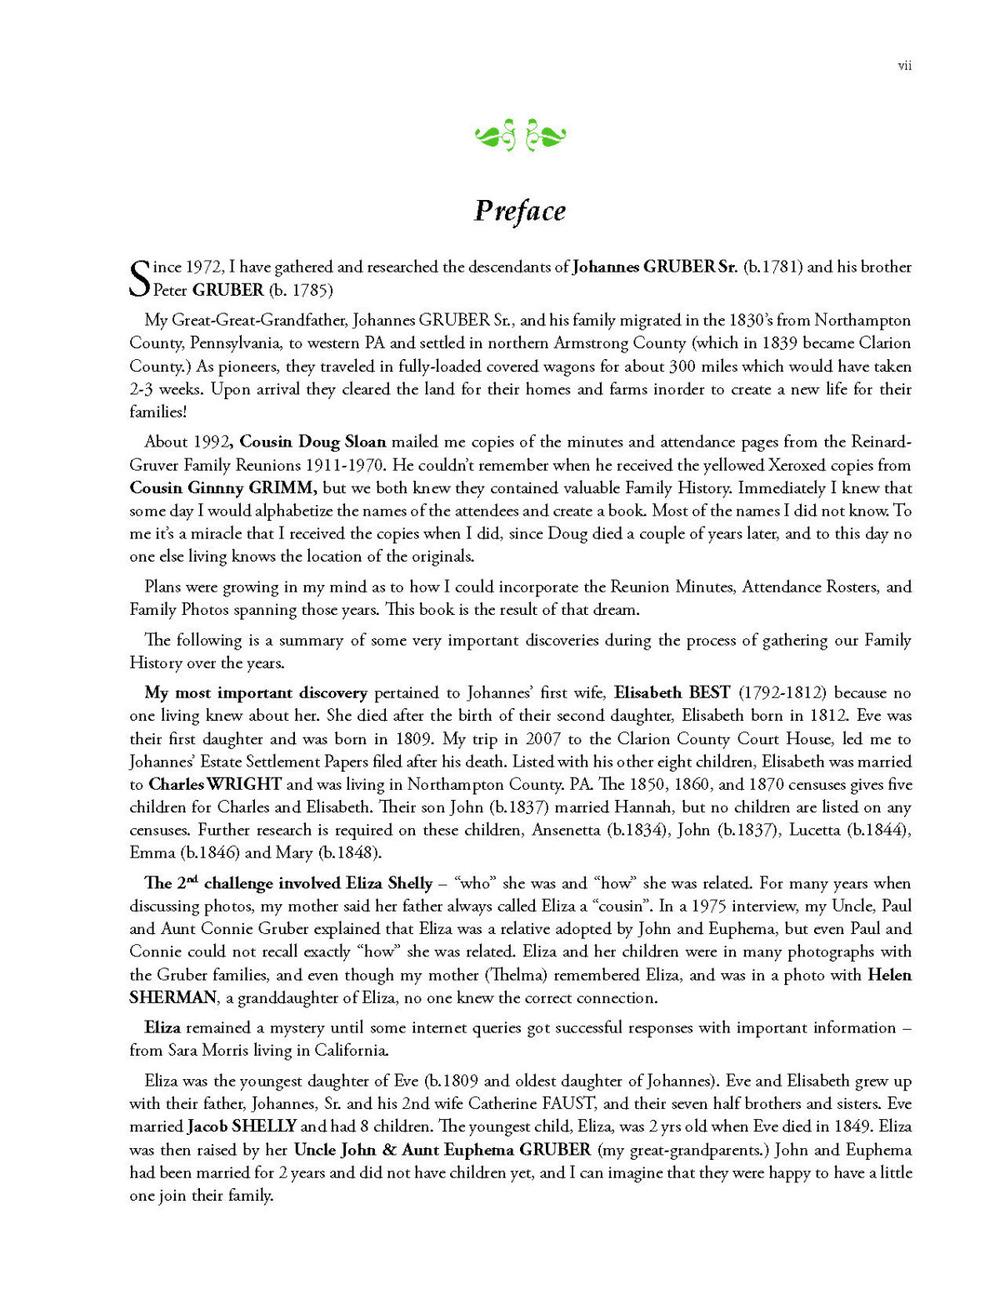 binder1_page_06.jpg